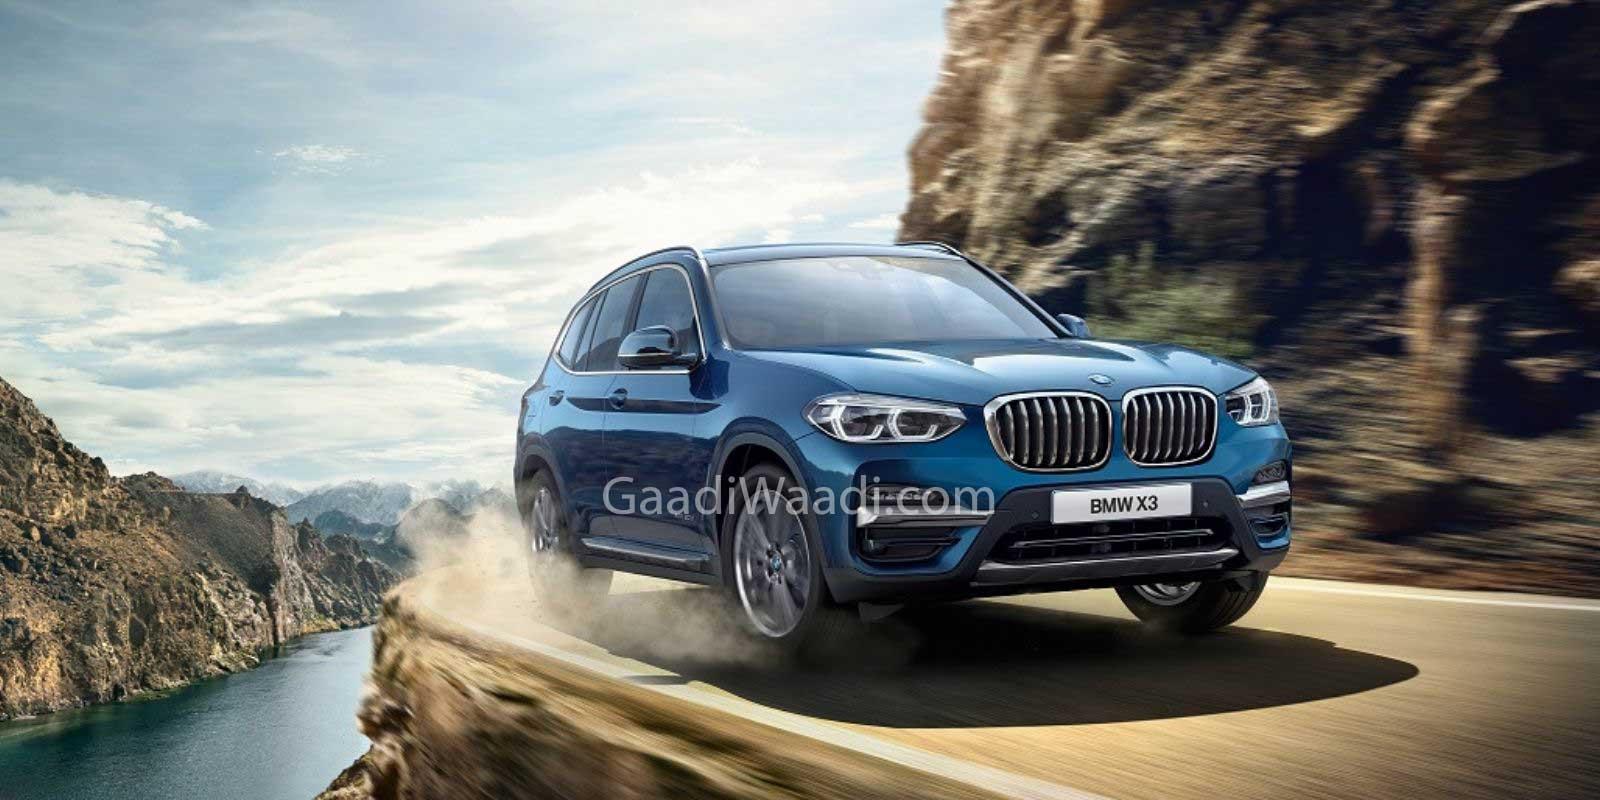 2021 BMW X3 xDrive30i SportX Launched In India At Rs. 56.50 Lakh - GaadiWaadi.com